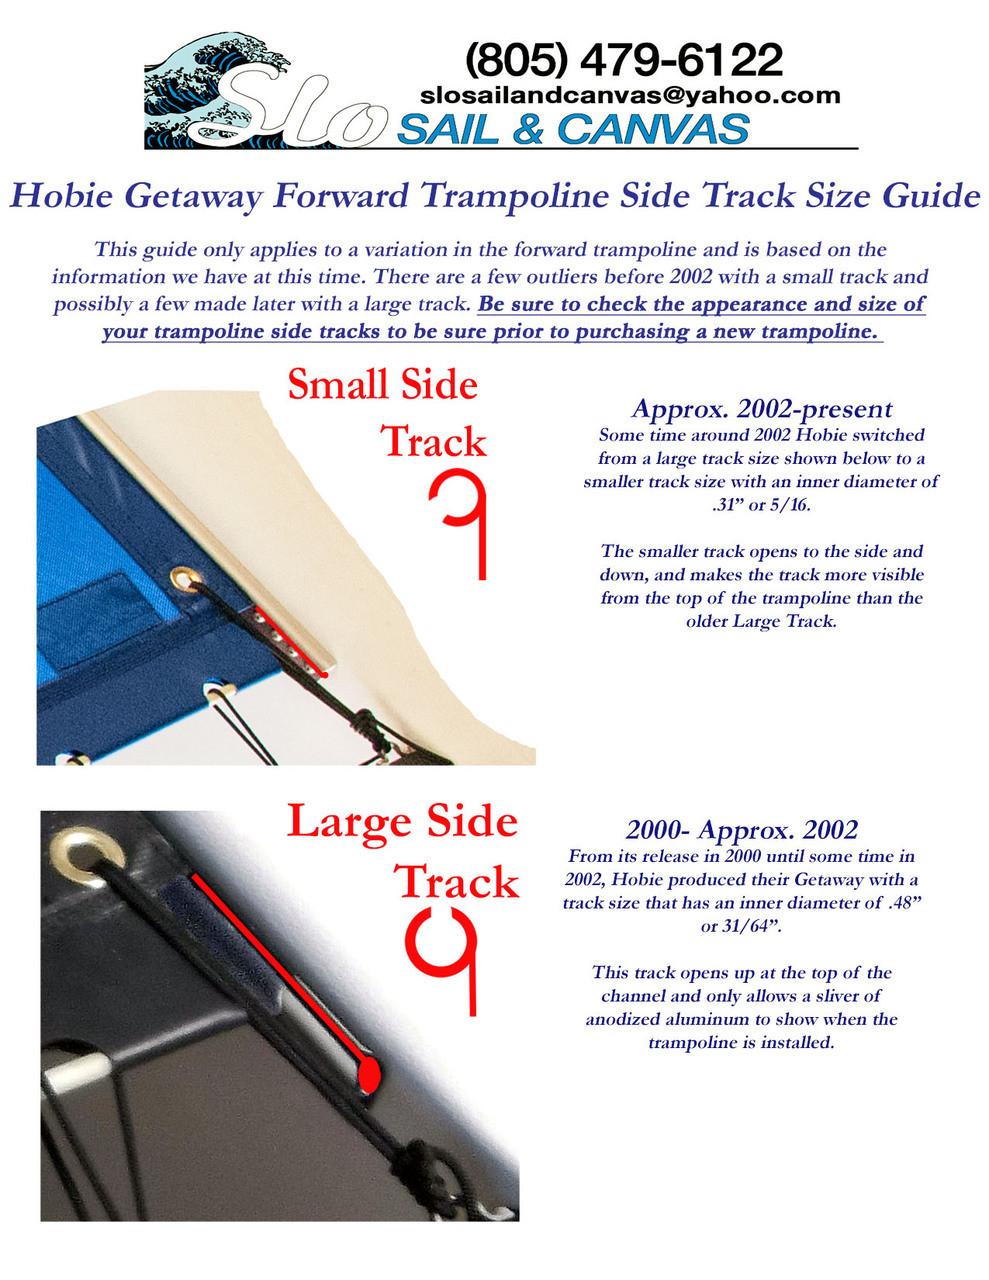 Track Size Guide for Forward Black Bias Cut Black Mesh Trampoline to fit a Hobie® Getaway